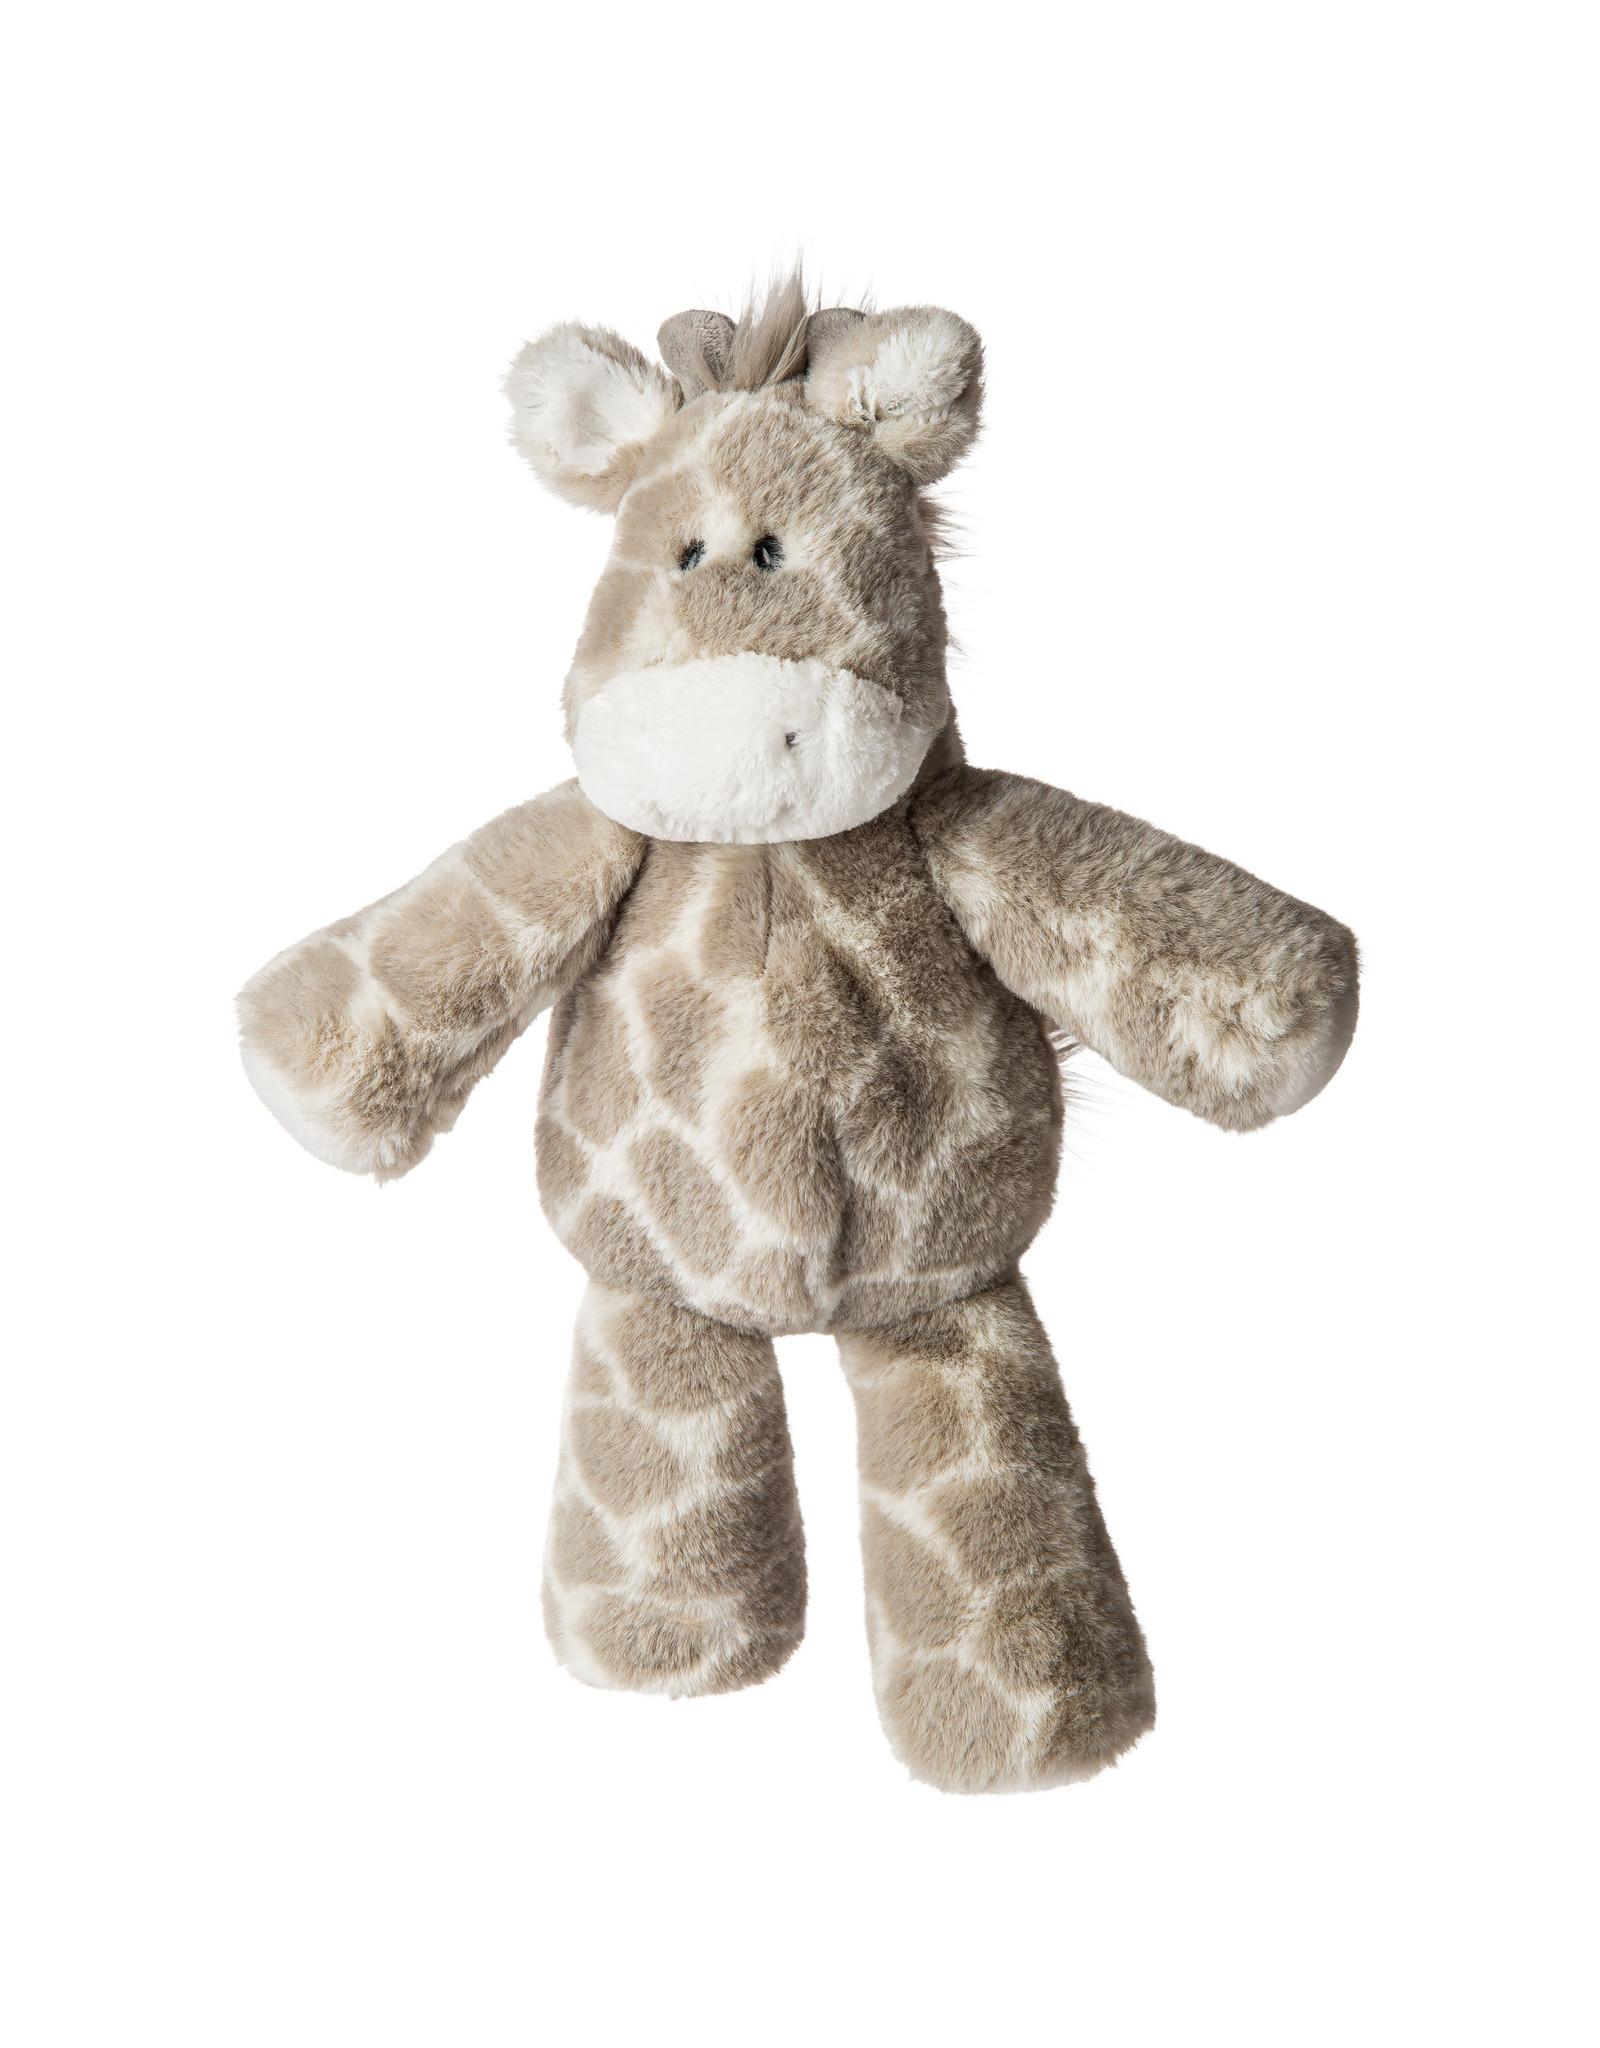 Mary Meyer Marshmallow Greyling Giraffe 13 in.